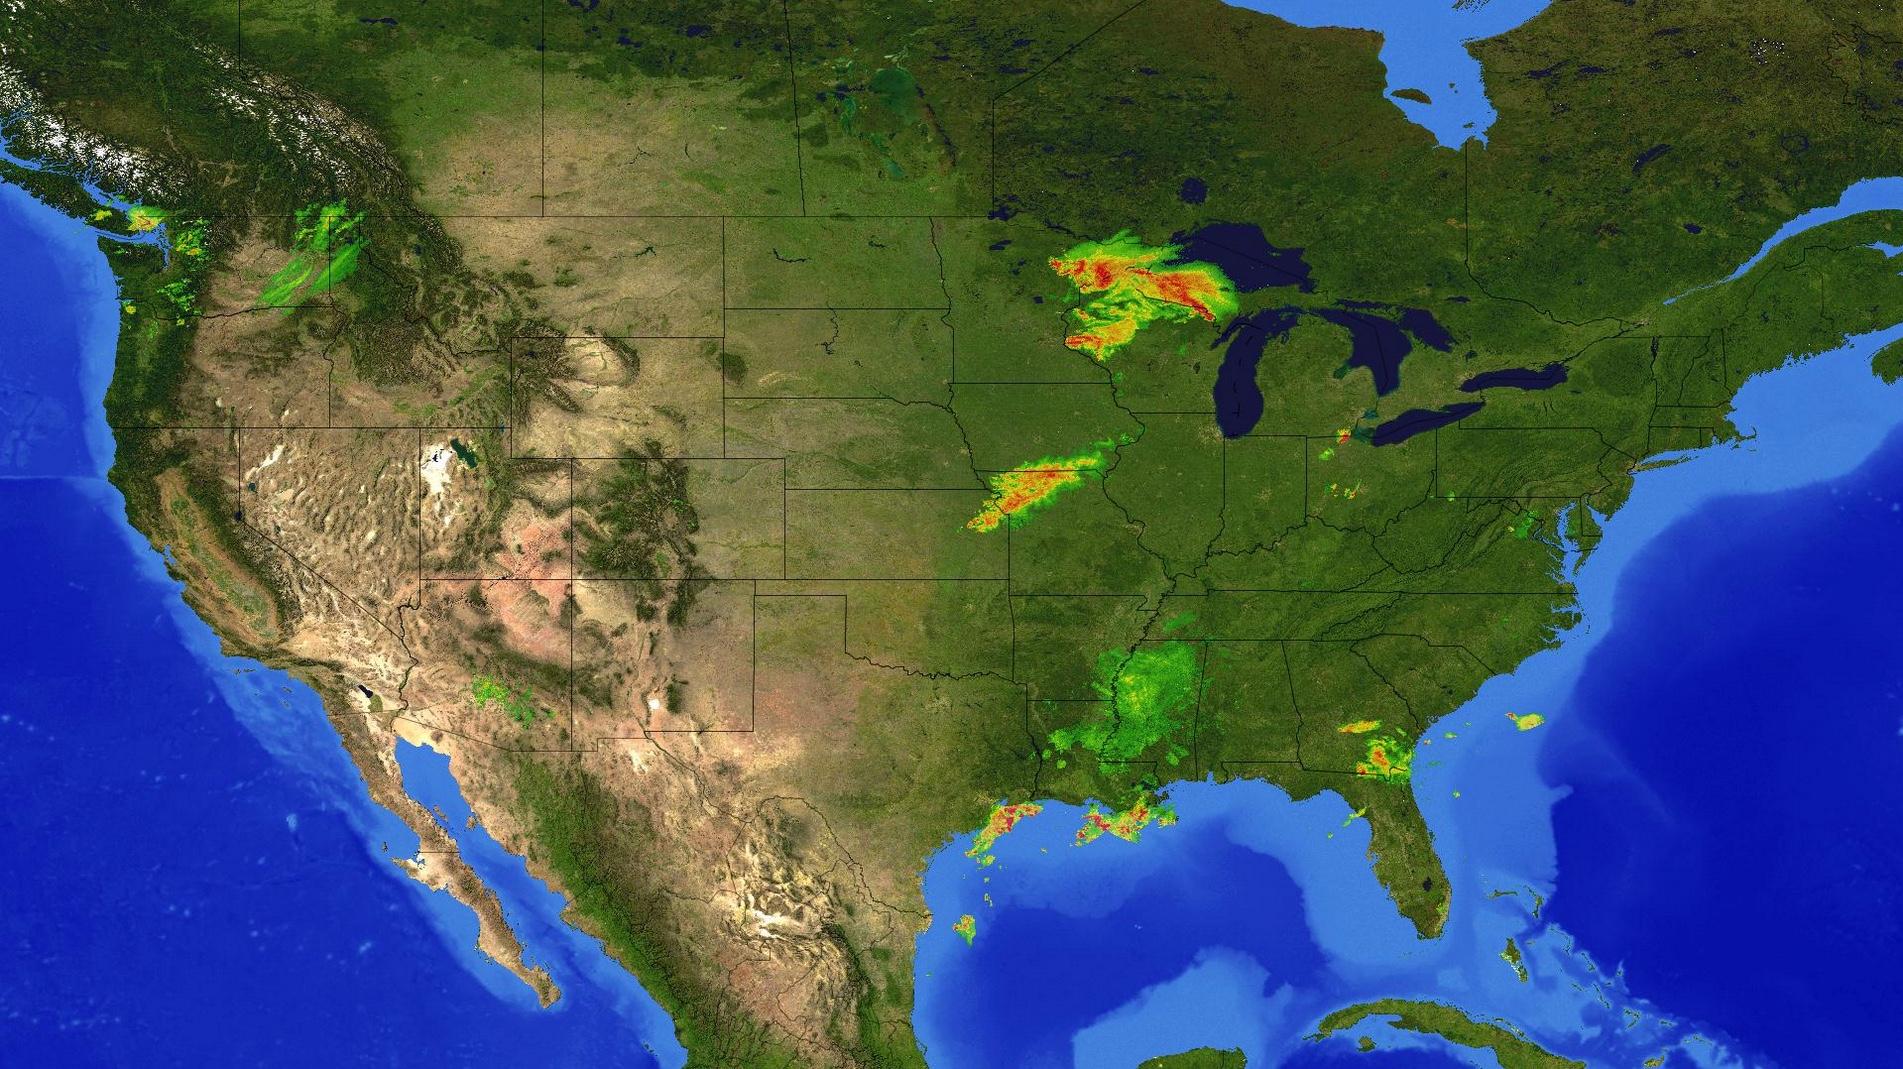 weather maps for digital signage